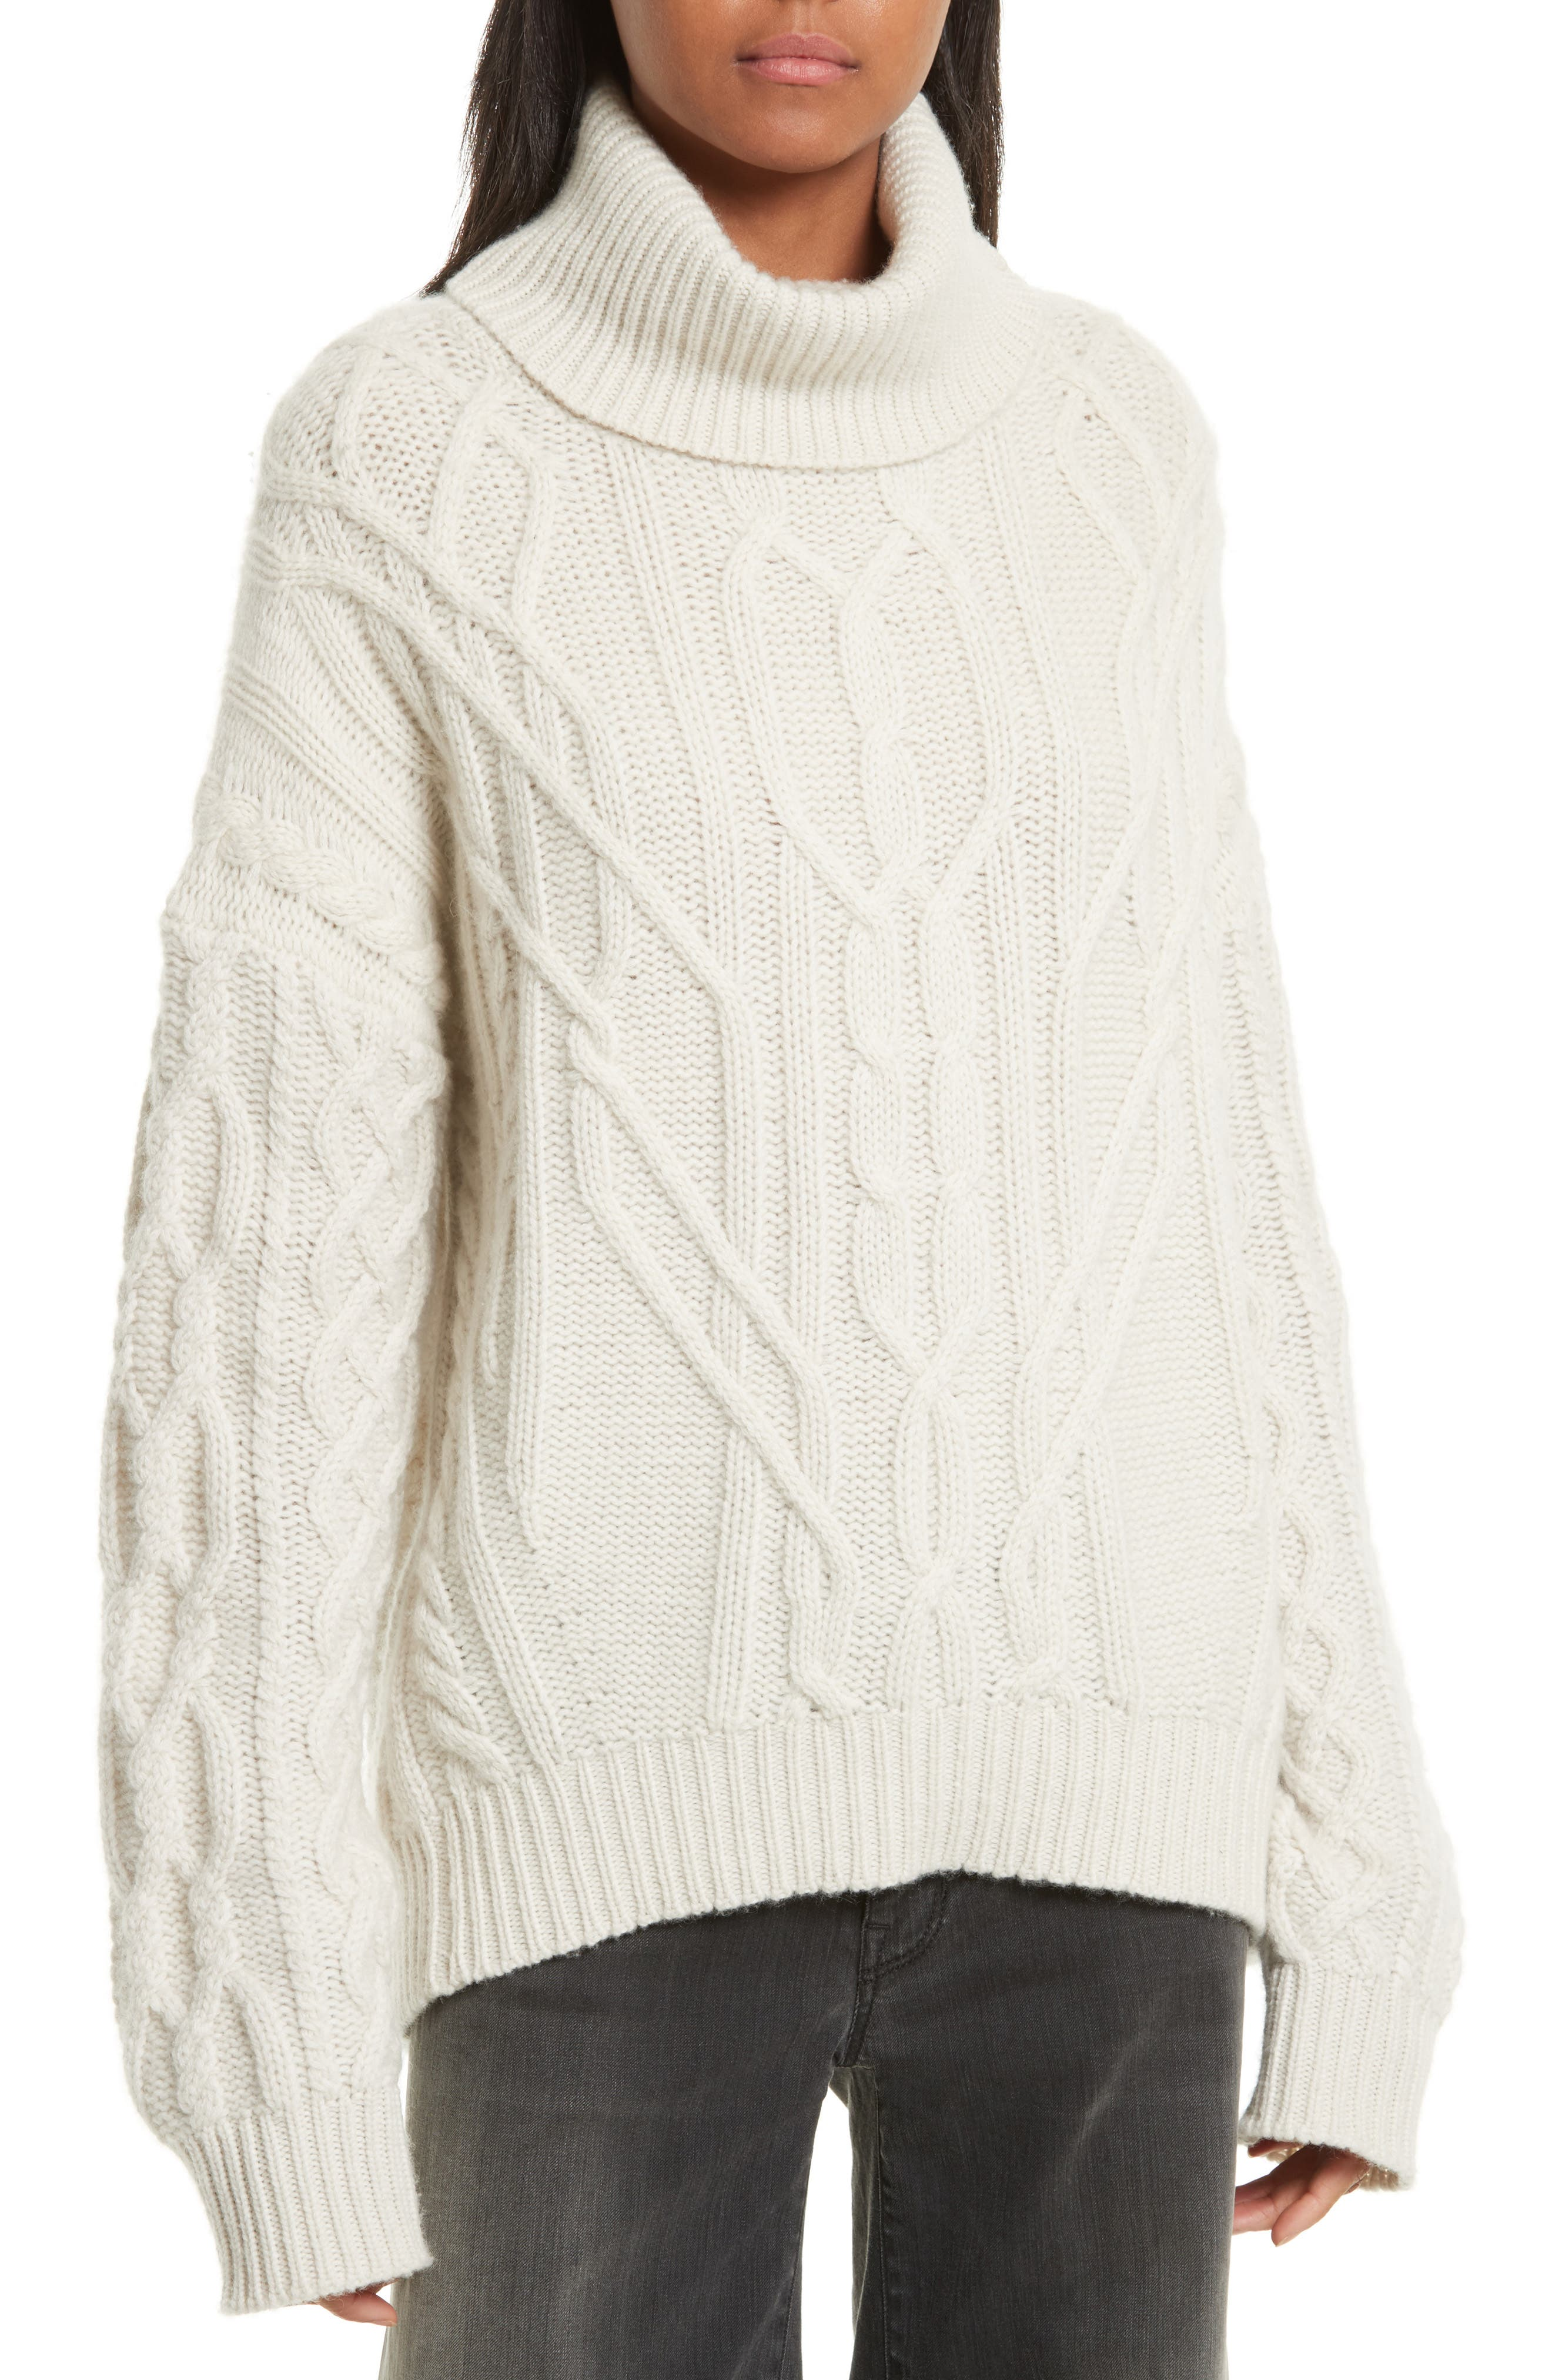 Cecil Cable Knit Cashmere Turtleneck Sweater,                             Main thumbnail 1, color,                             902